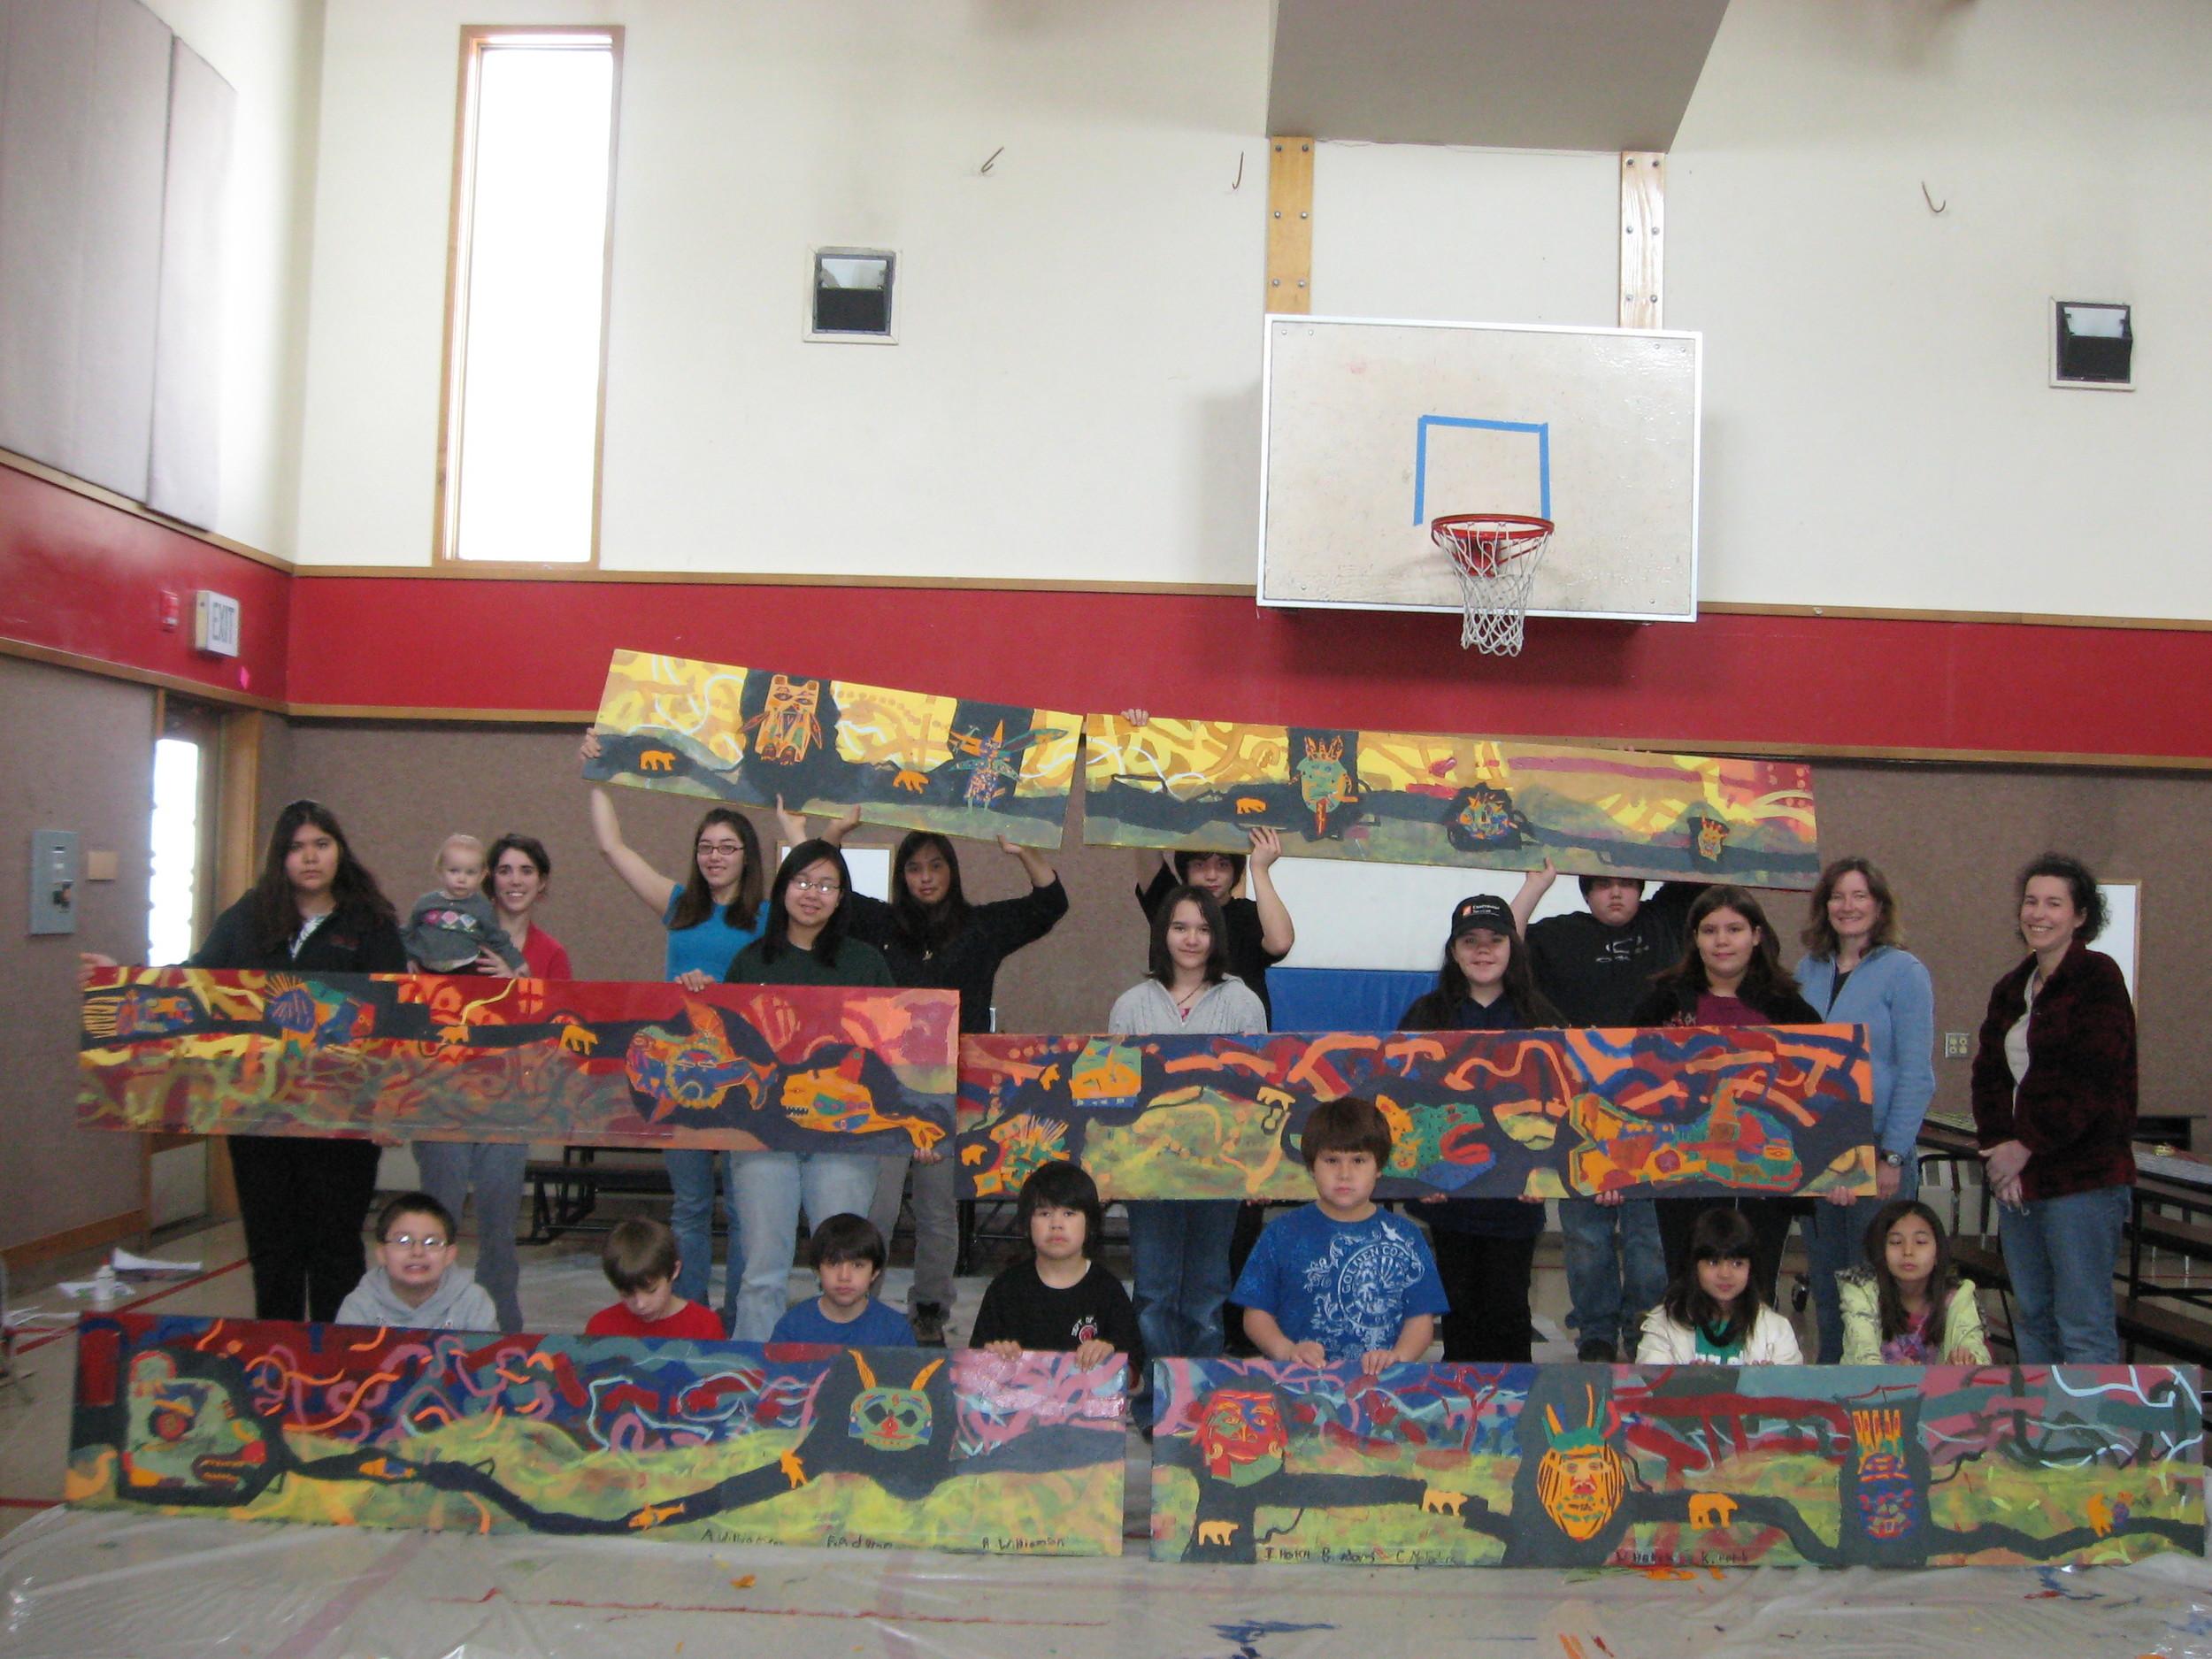 school pics 2008 202.jpg